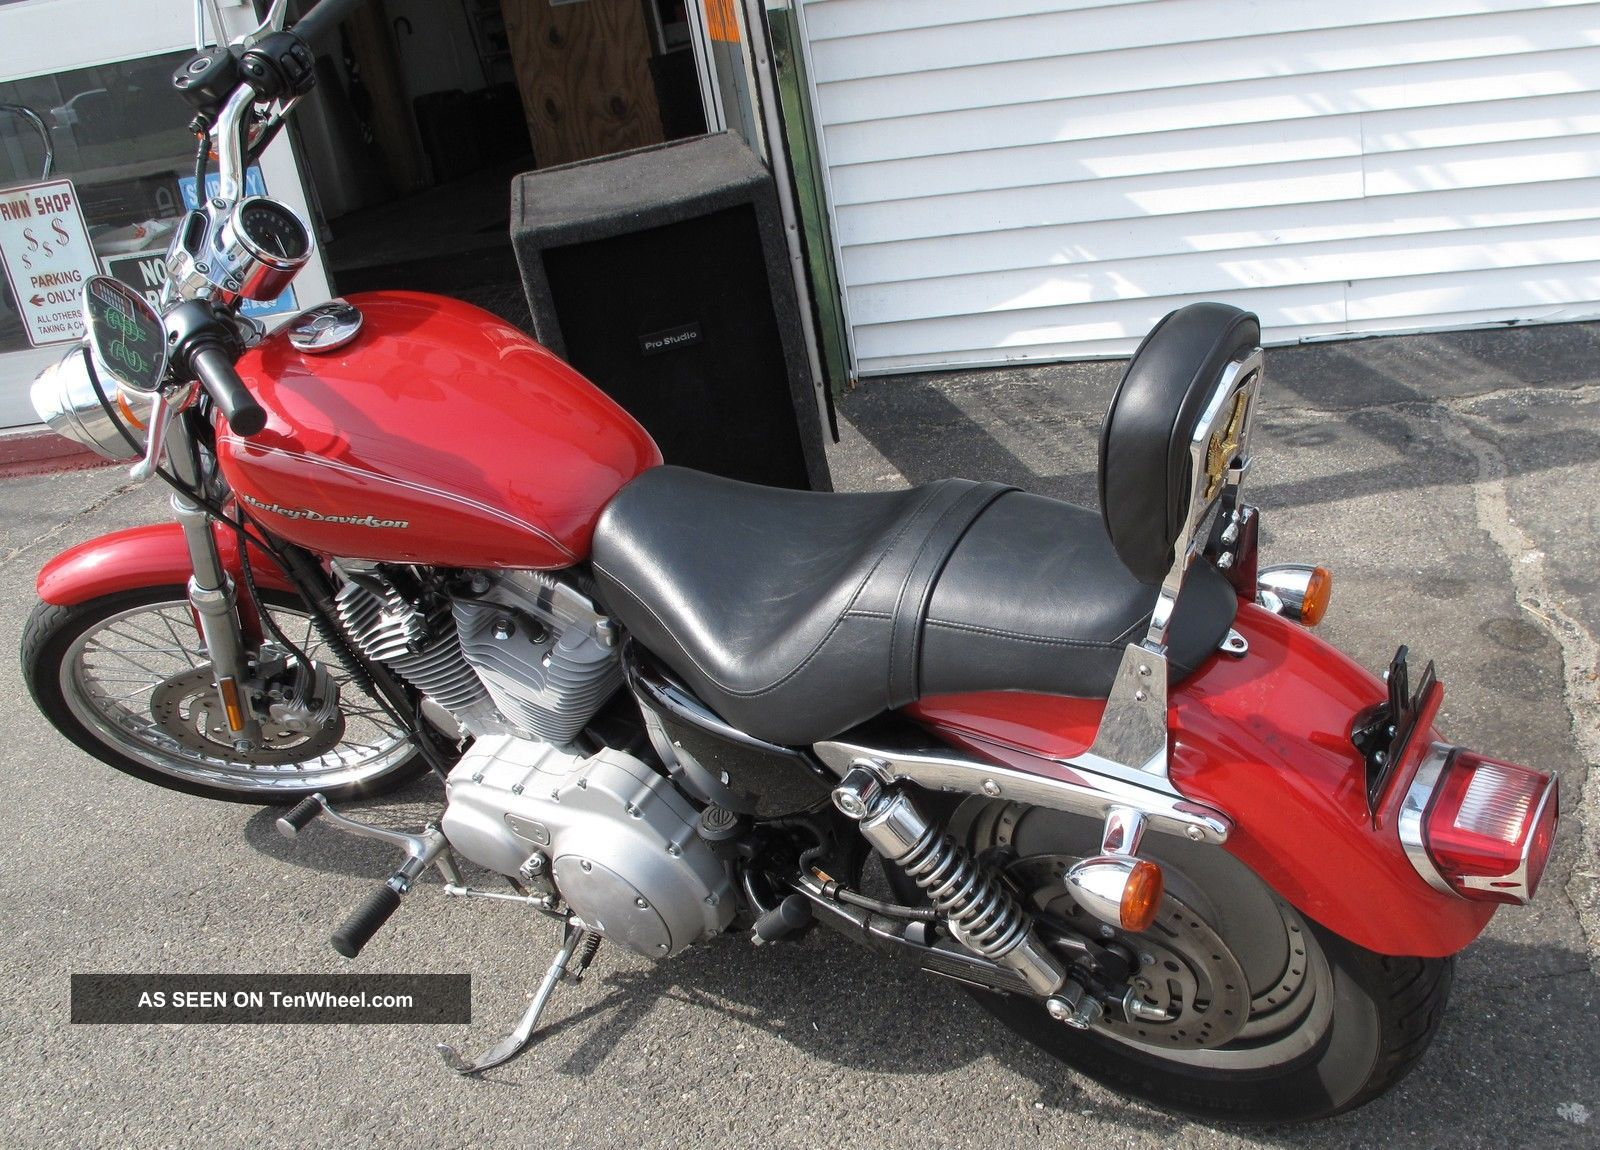 2004 Harley Davidson Sportster Xl883c Motorcycle Red 10k